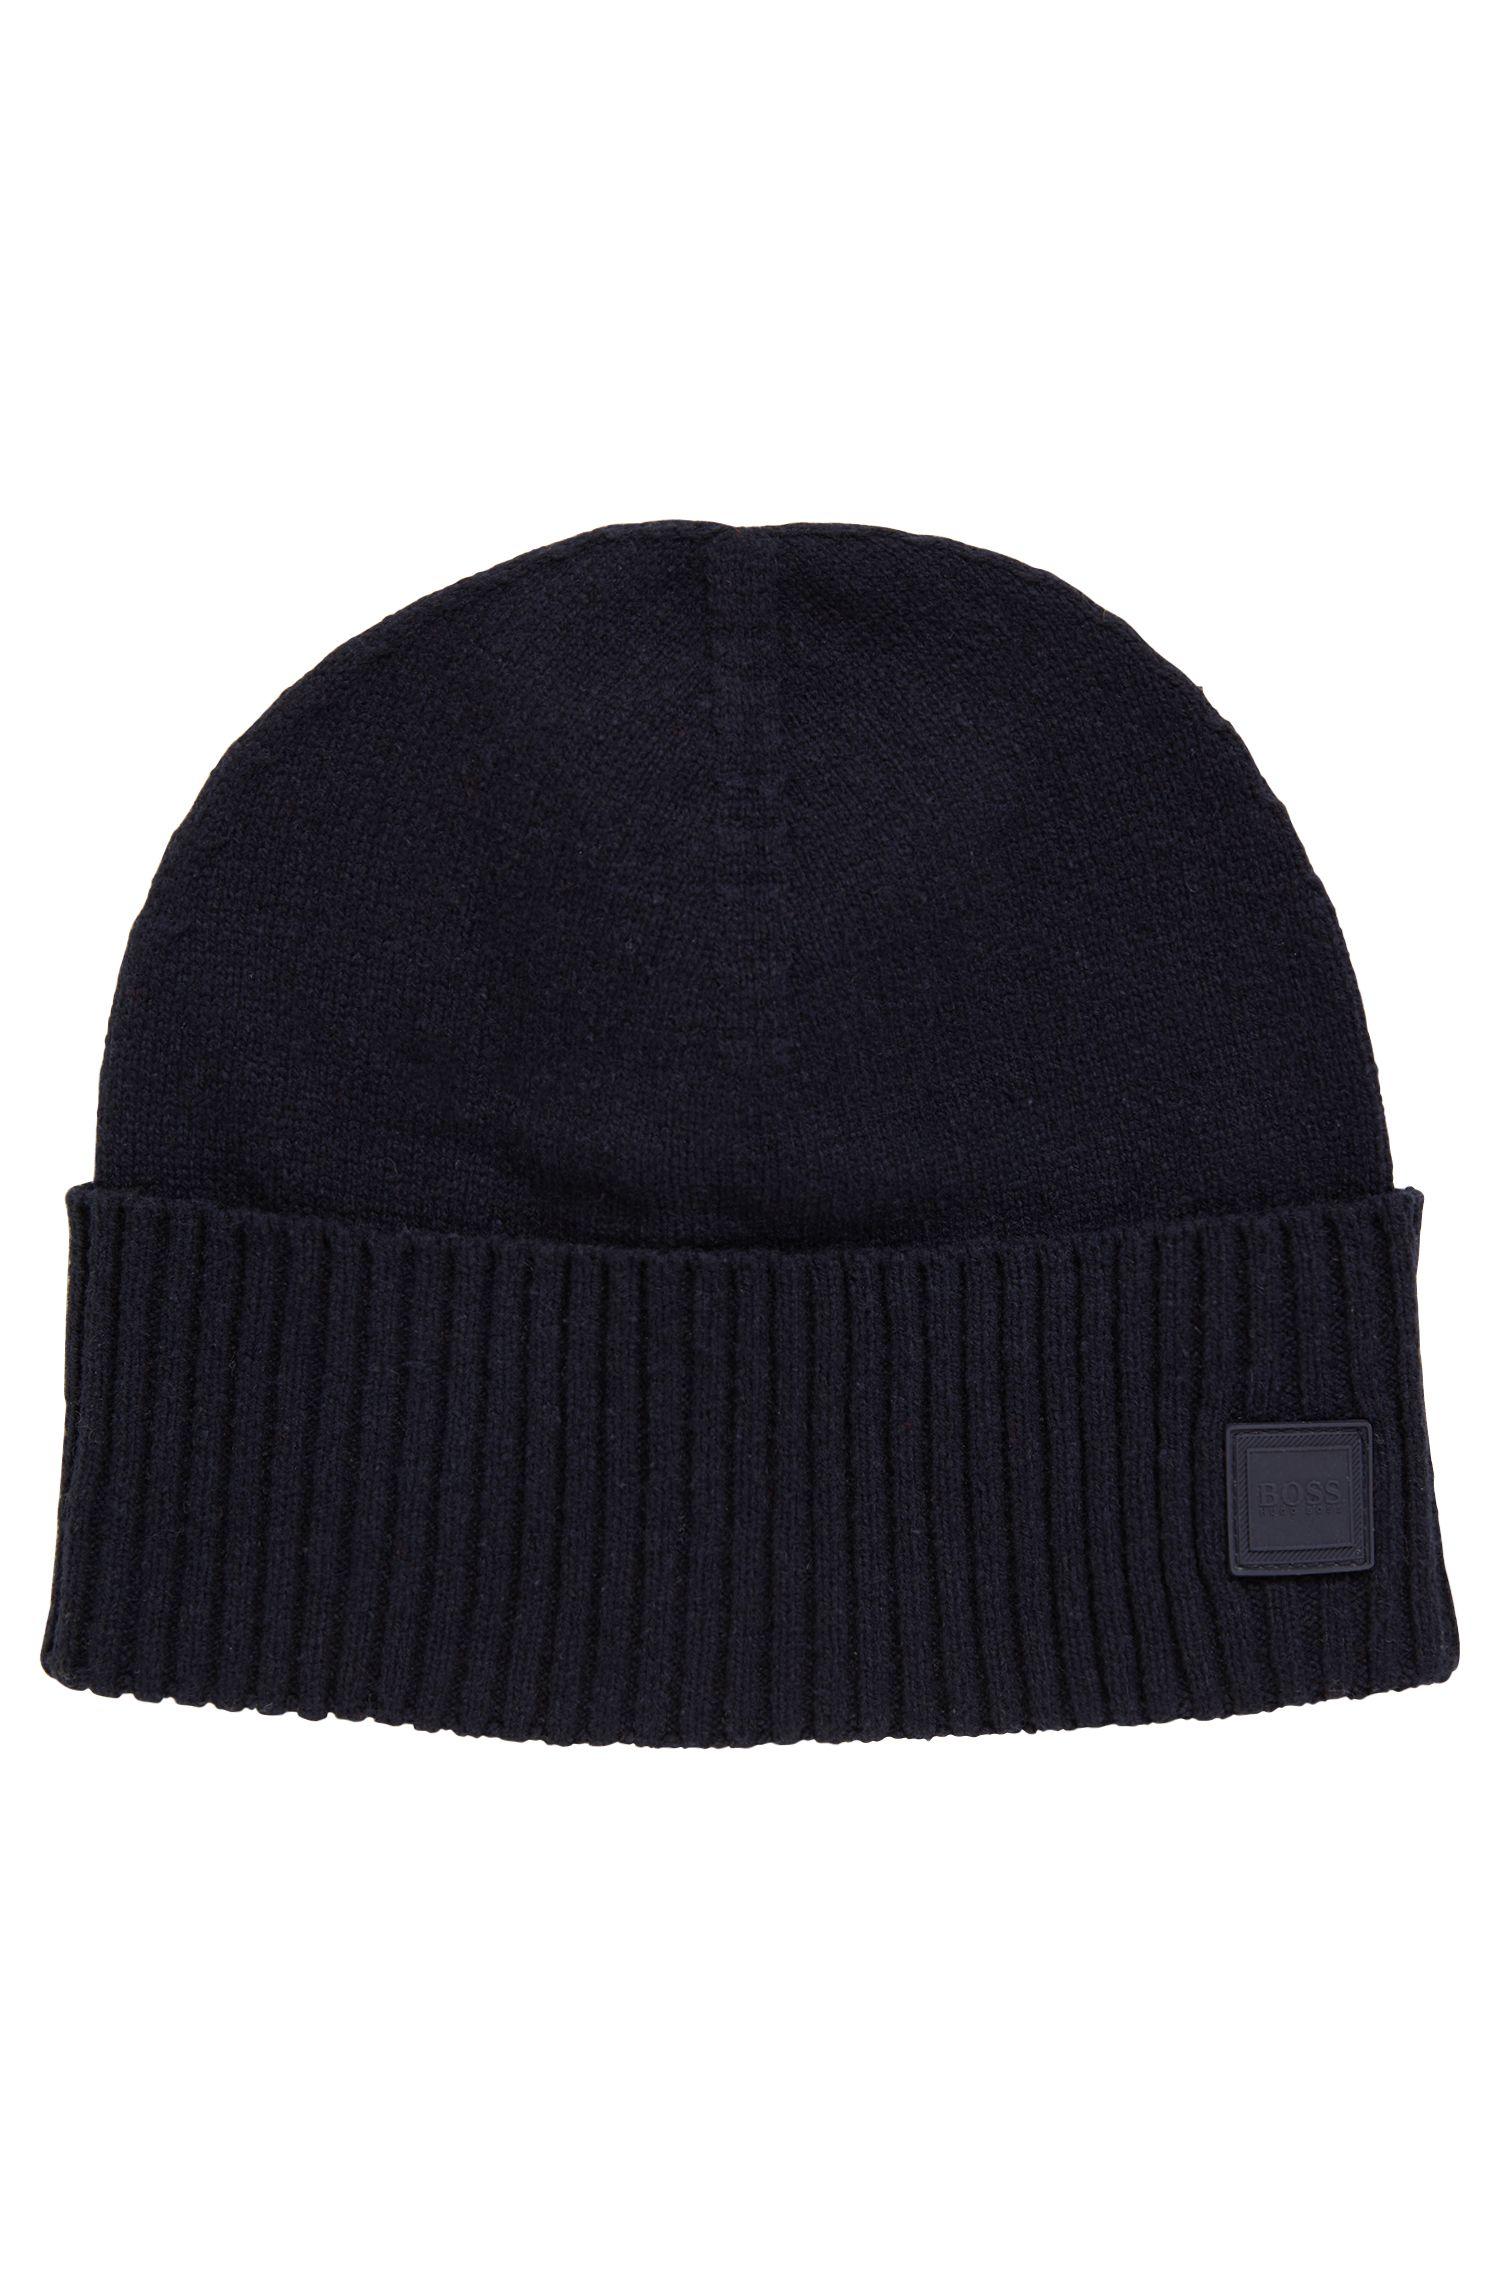 Feinstrick-Mütze mit geripptem Saumaufschlag, Dunkelblau